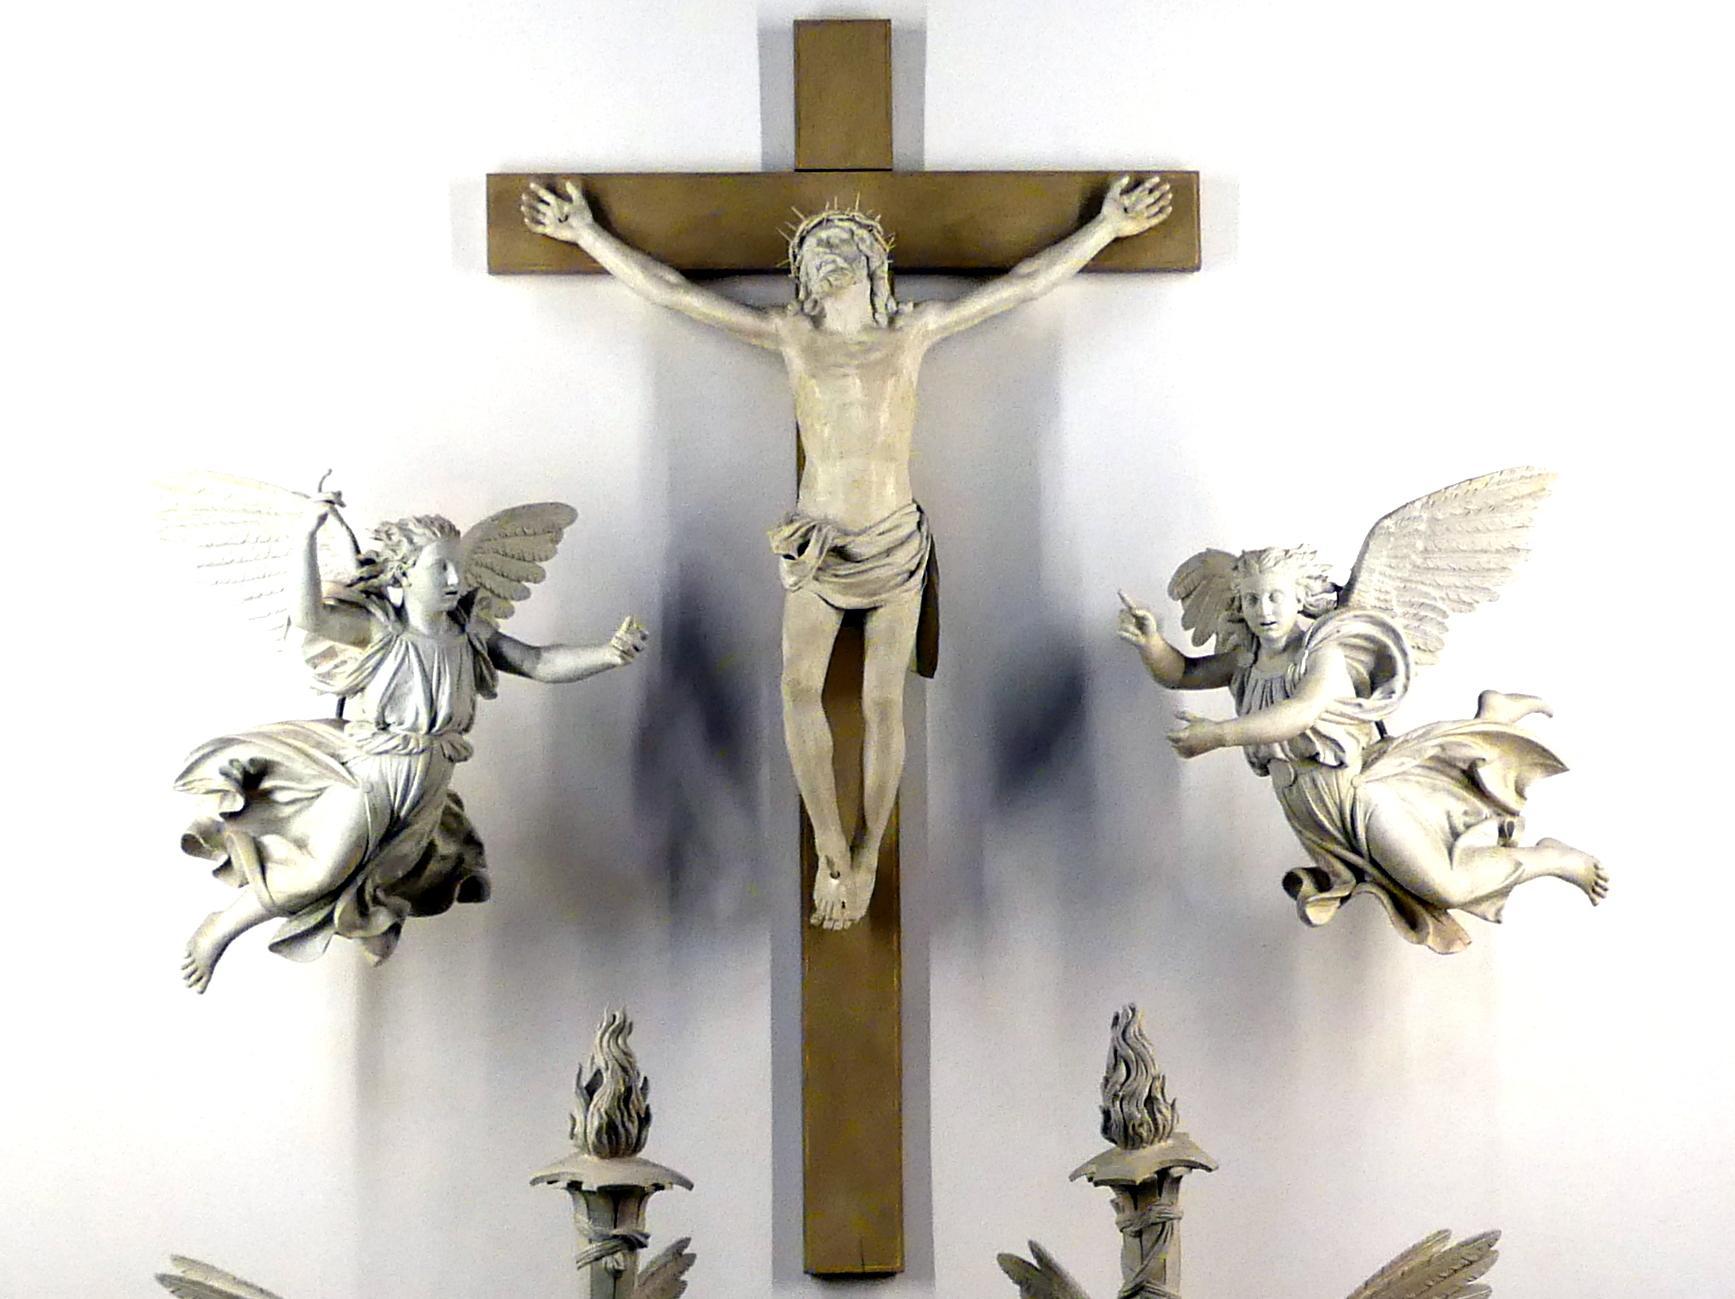 Antonio Begarelli: Kruzifix, nach 1534